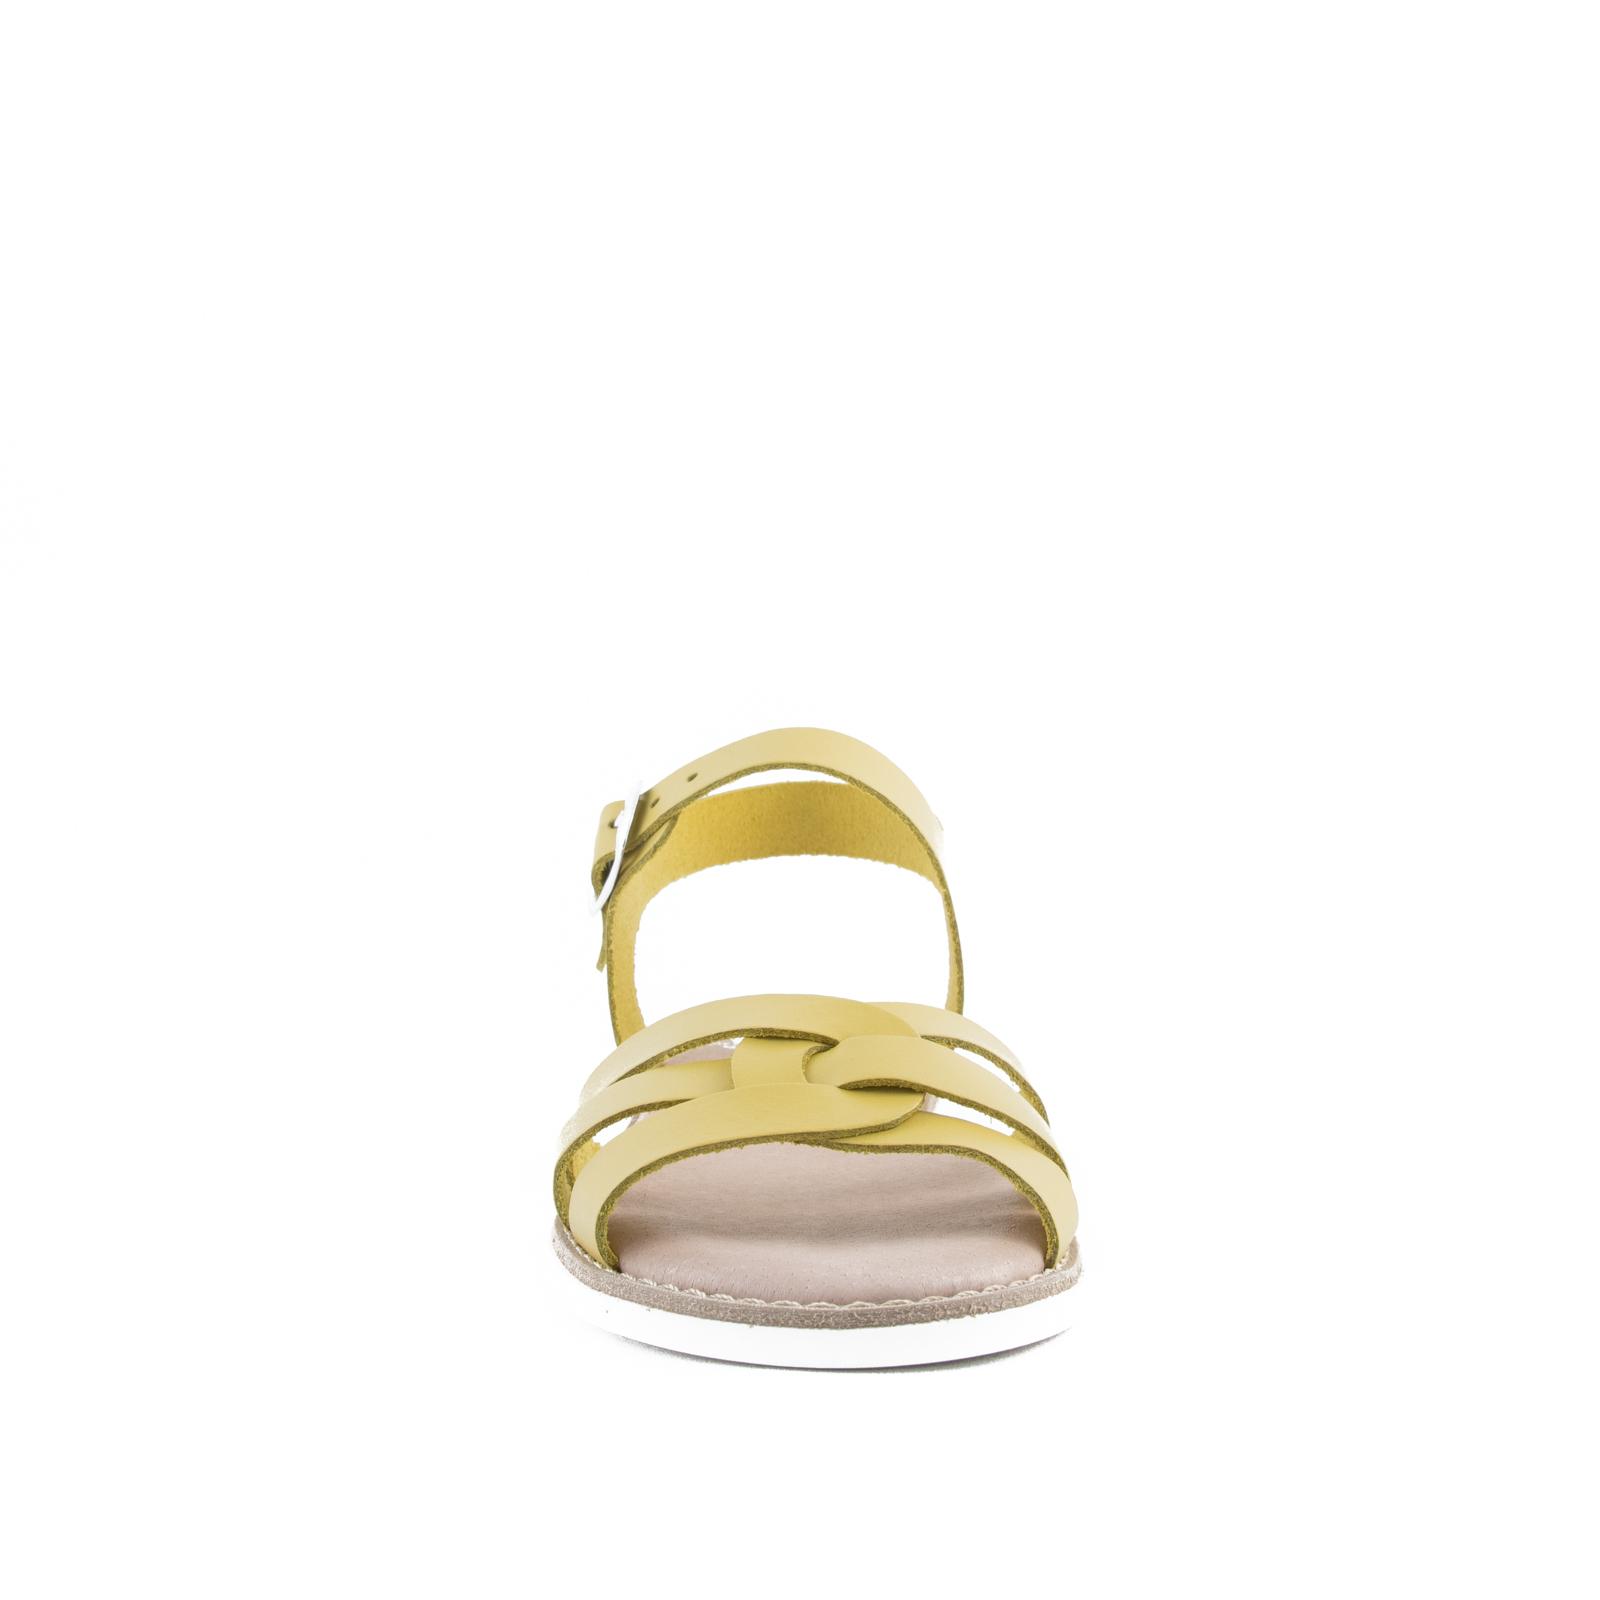 NENS Sandals Yellow 5760–M